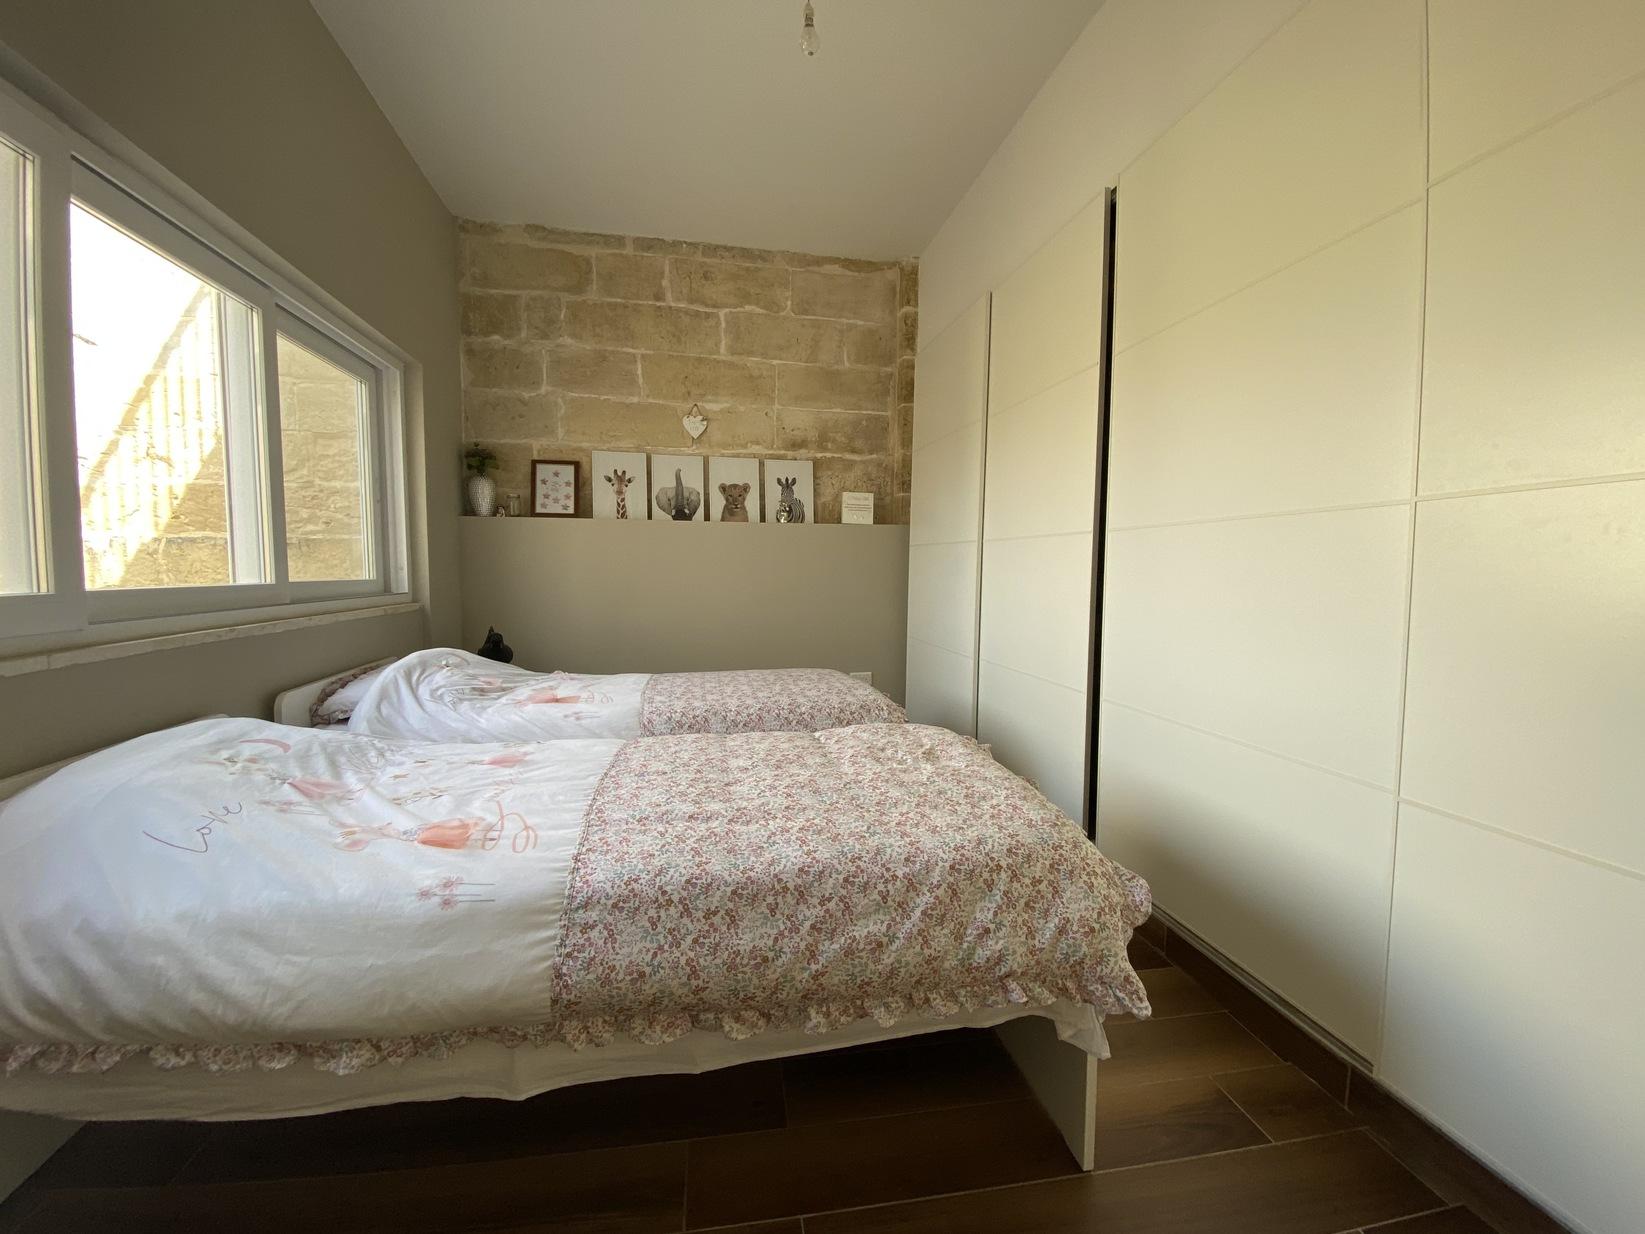 3 bed Town House For Rent in Lija, Lija - thumb 12